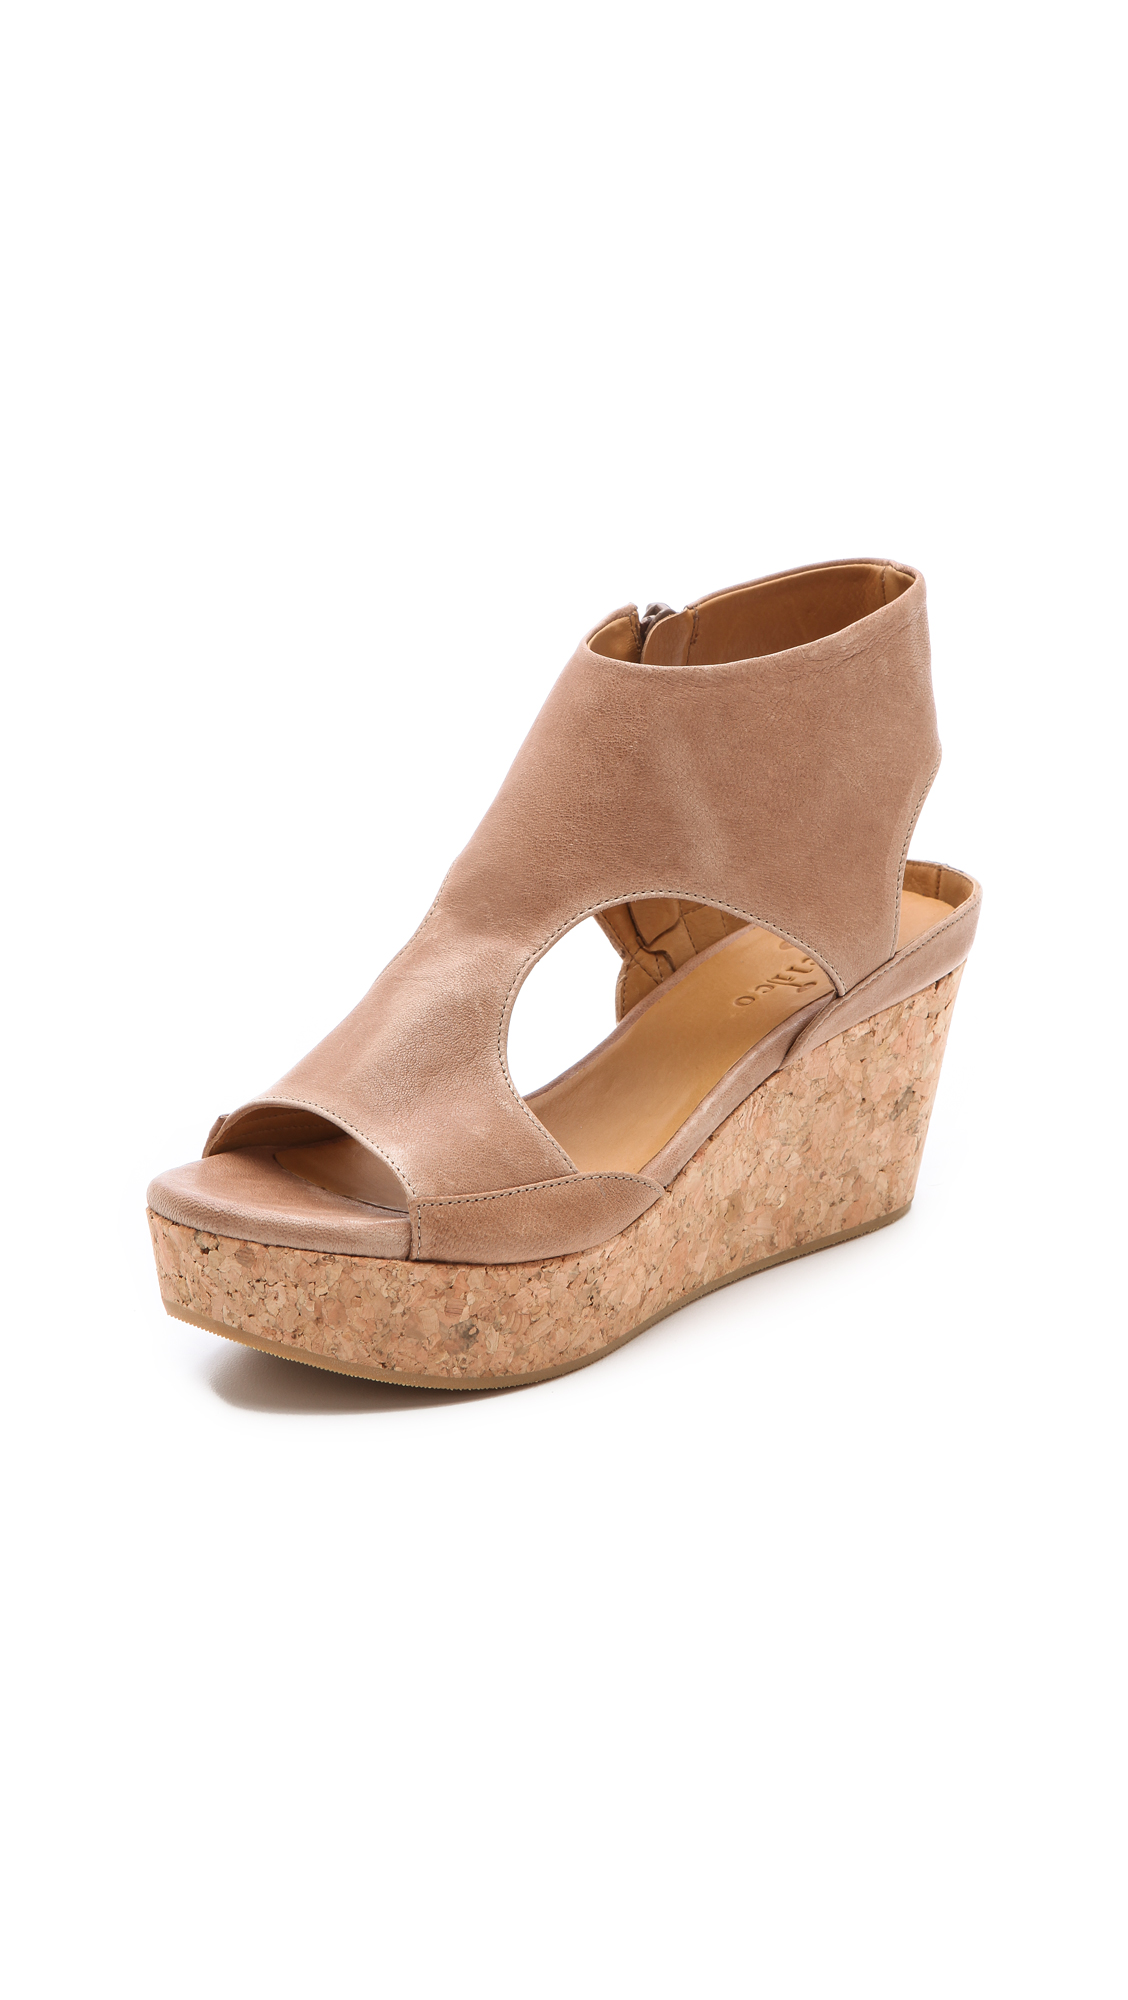 coclico mosaic cork wedge sandals in beige lyst